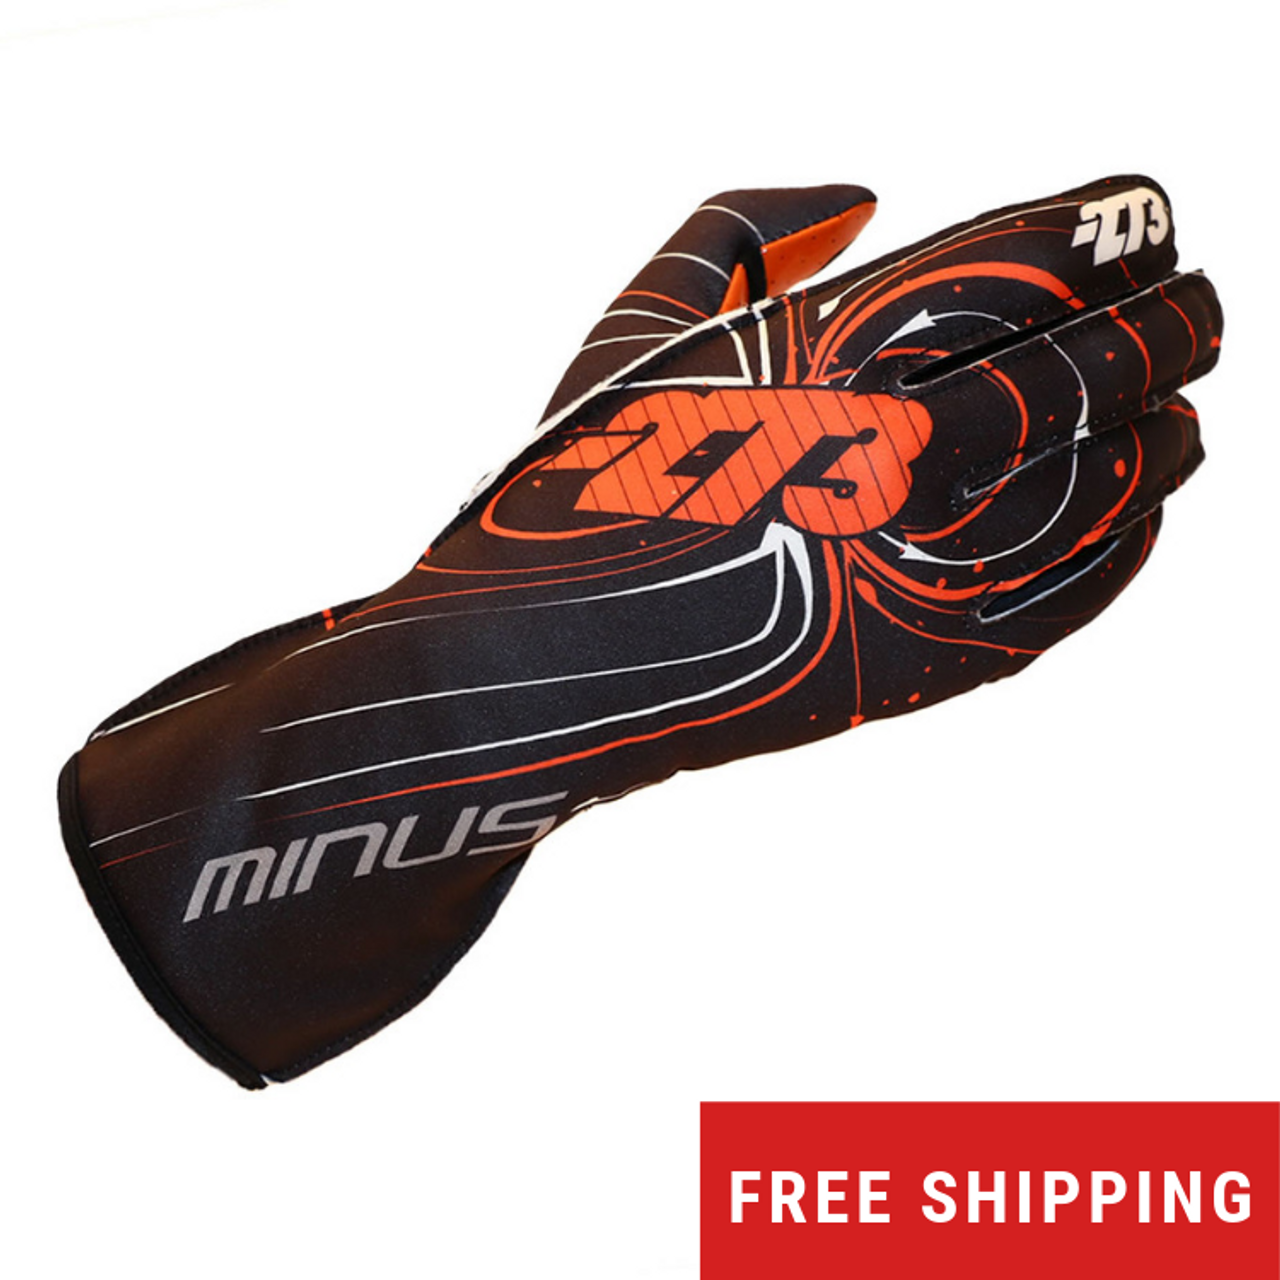 -273 Zero Karting Glove - Orange